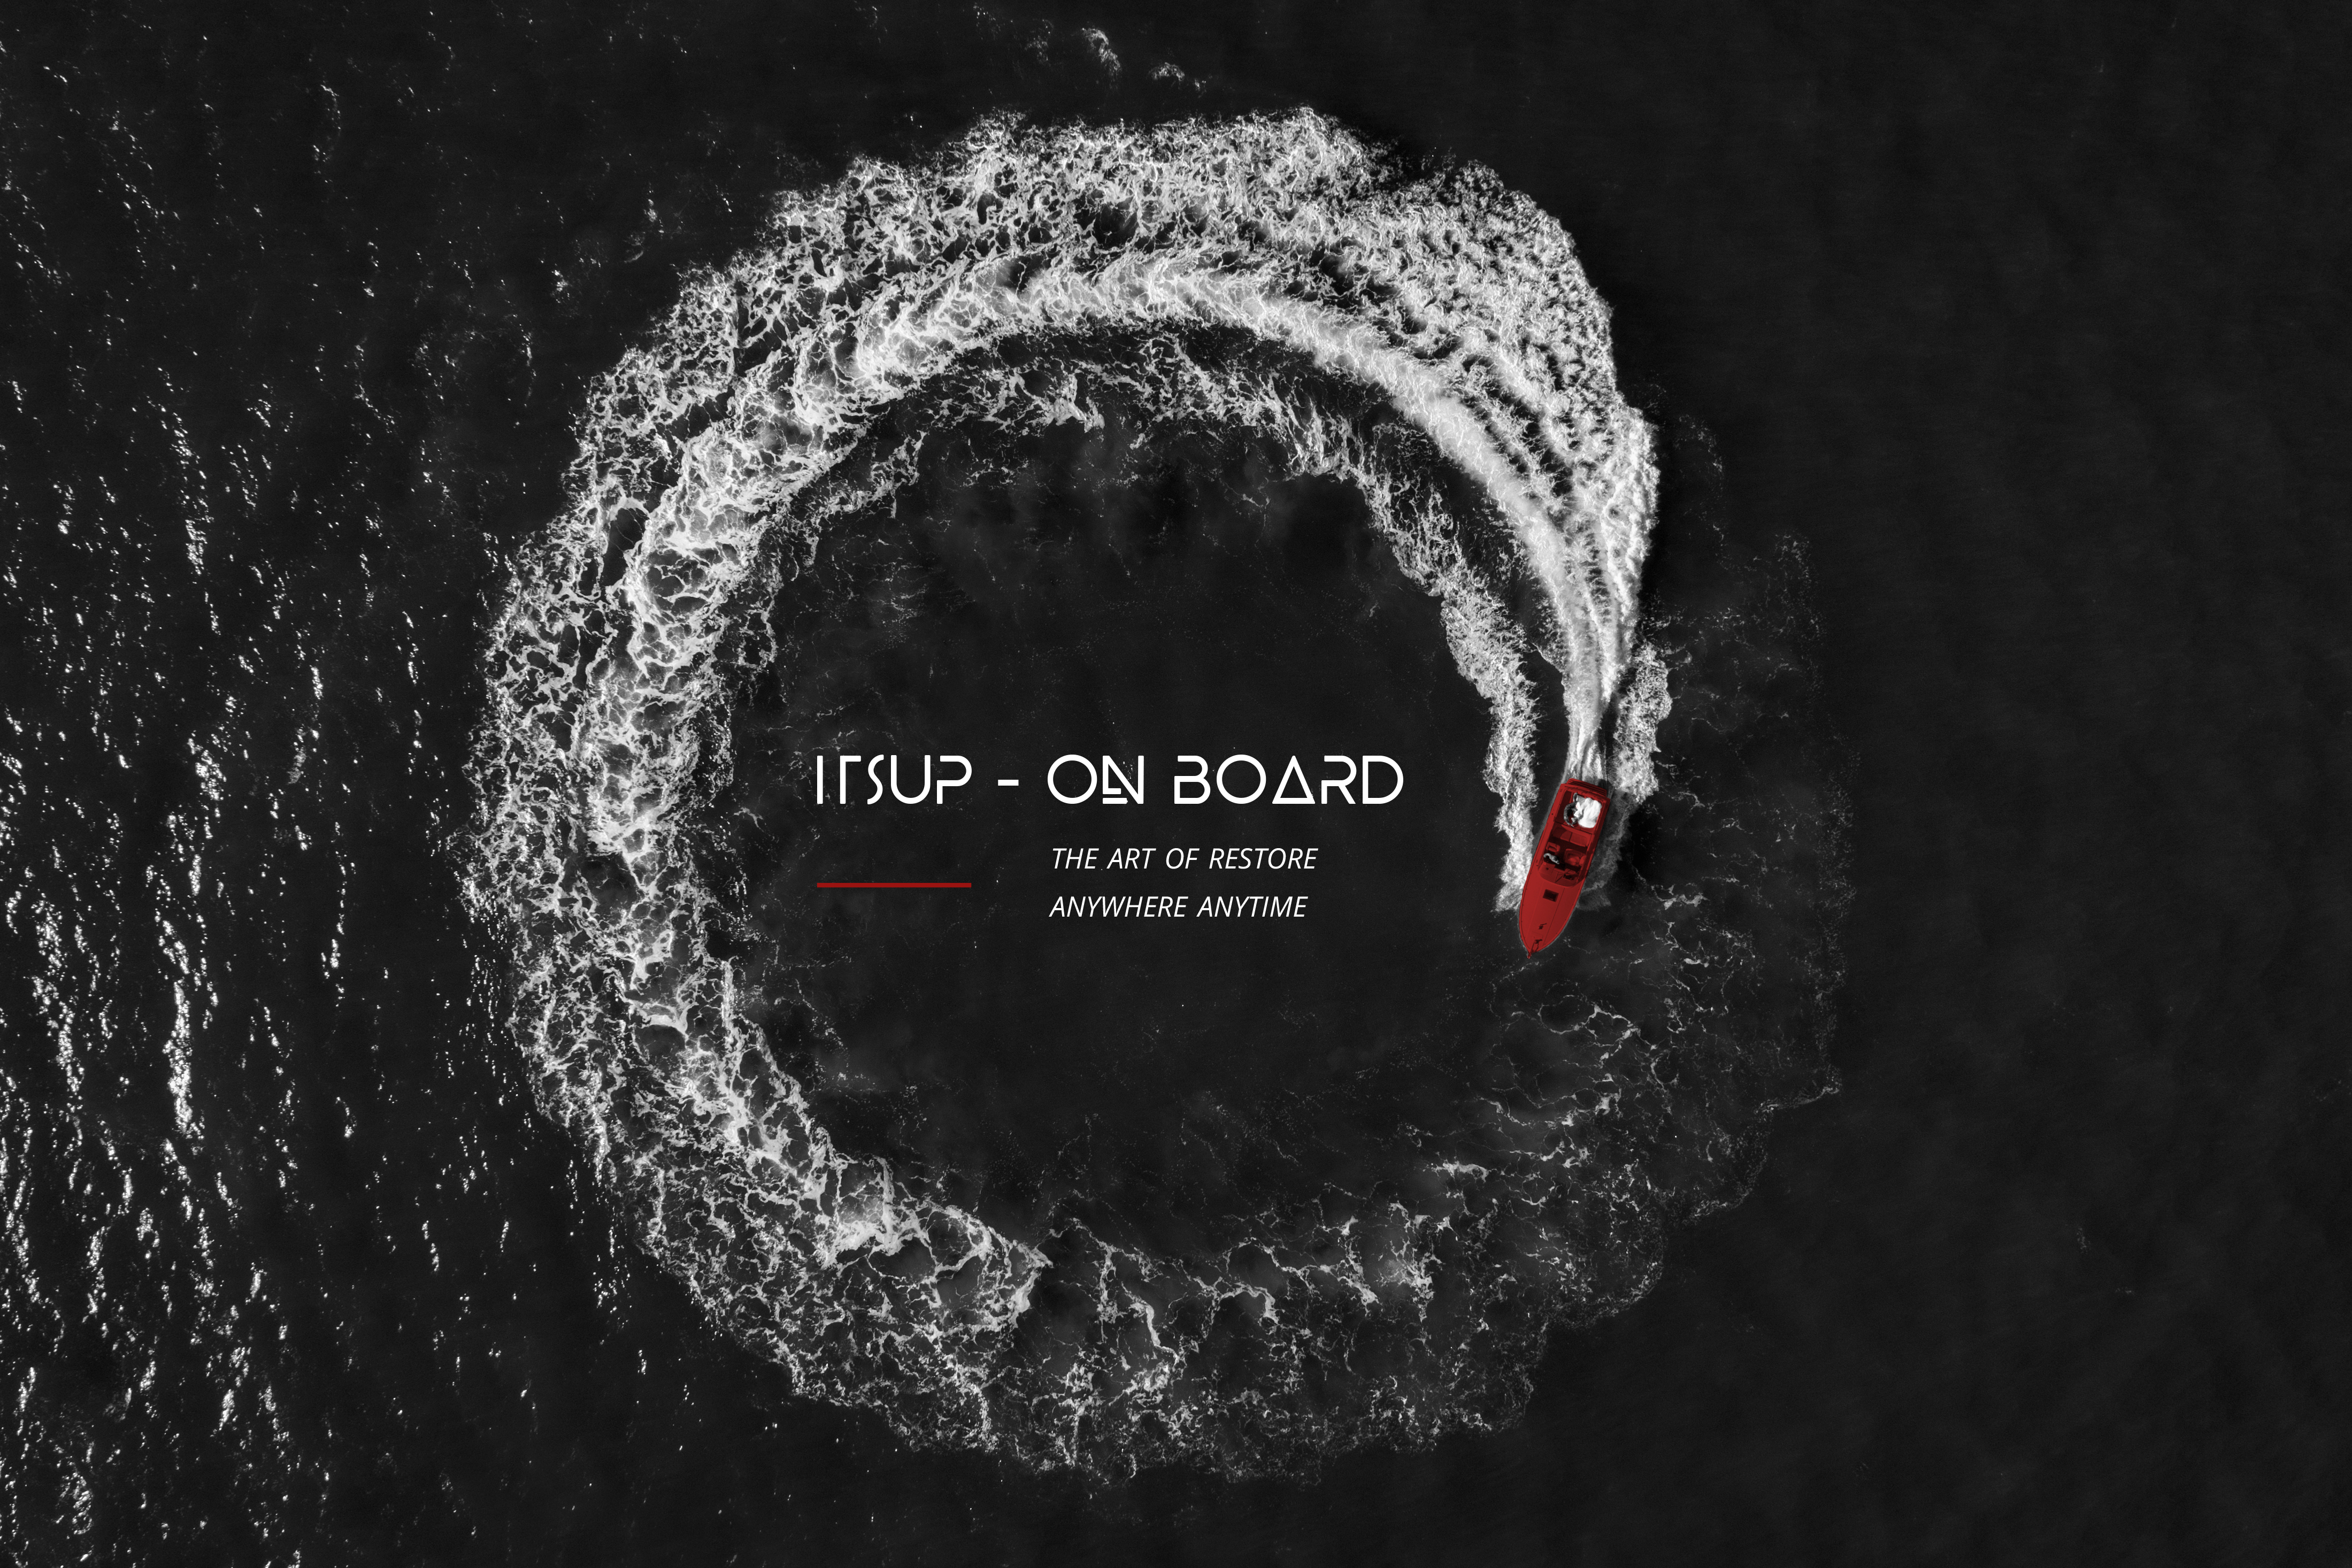 Itsupp_onboard